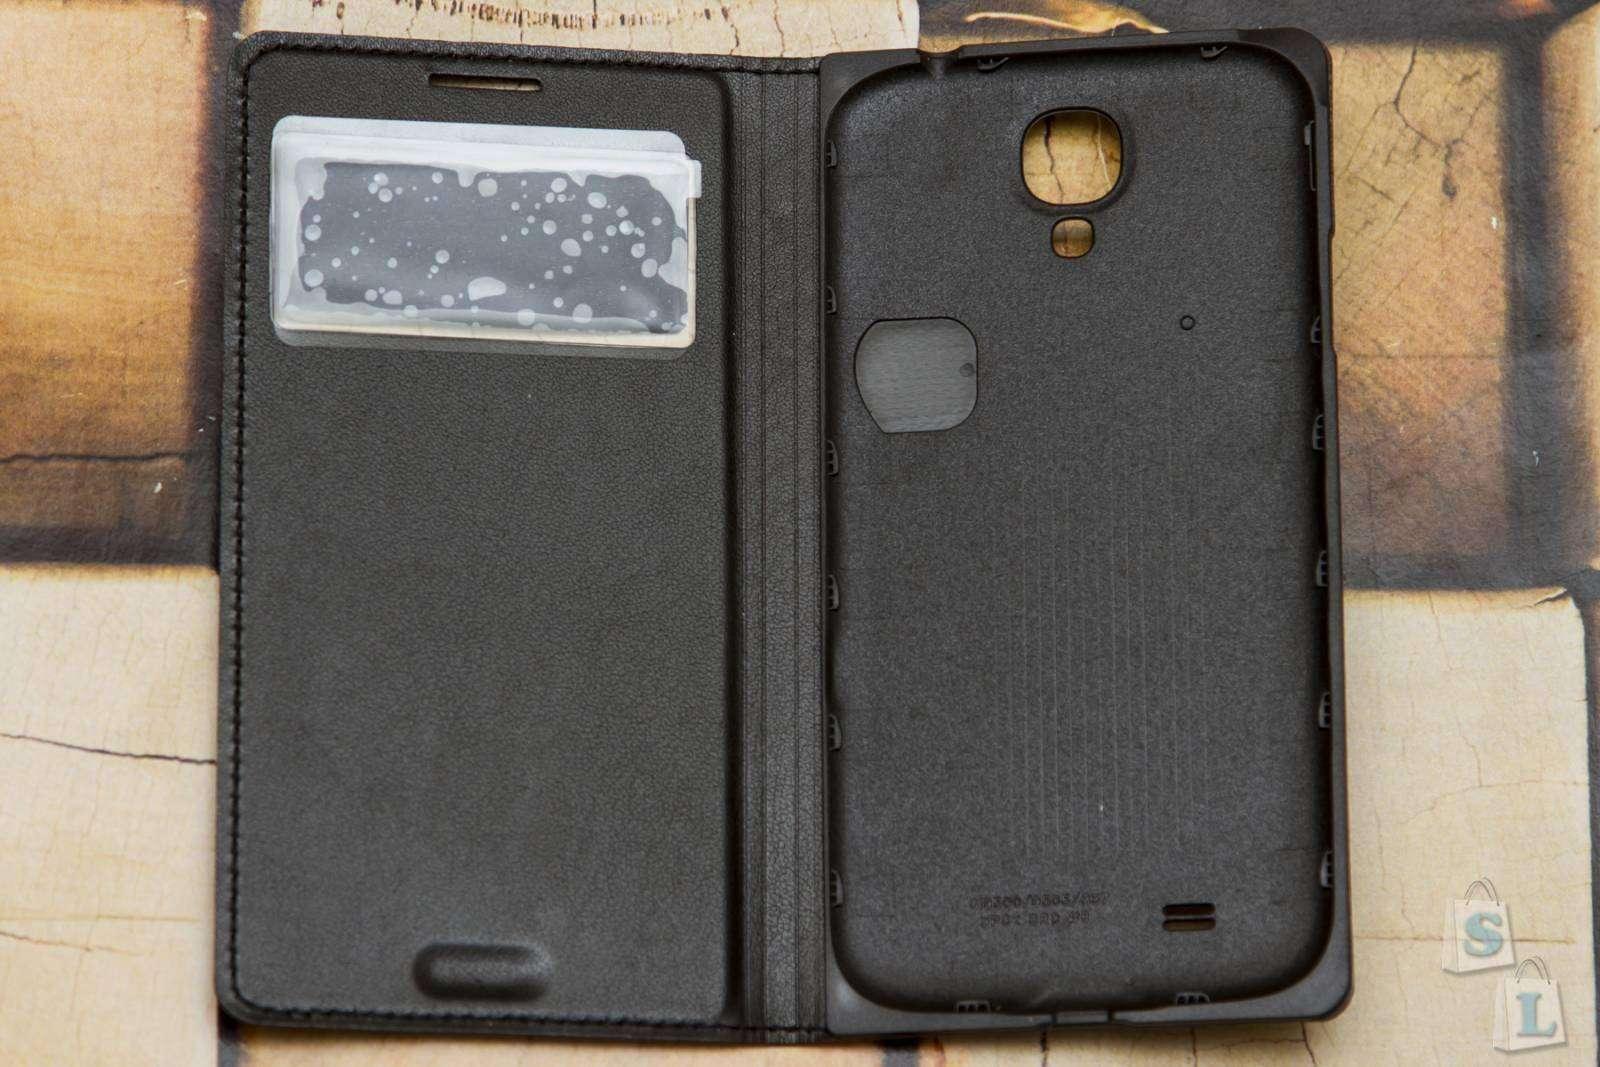 Aliexpress: Стильный смарт чехол для Samsung Galaxy S4 i9500